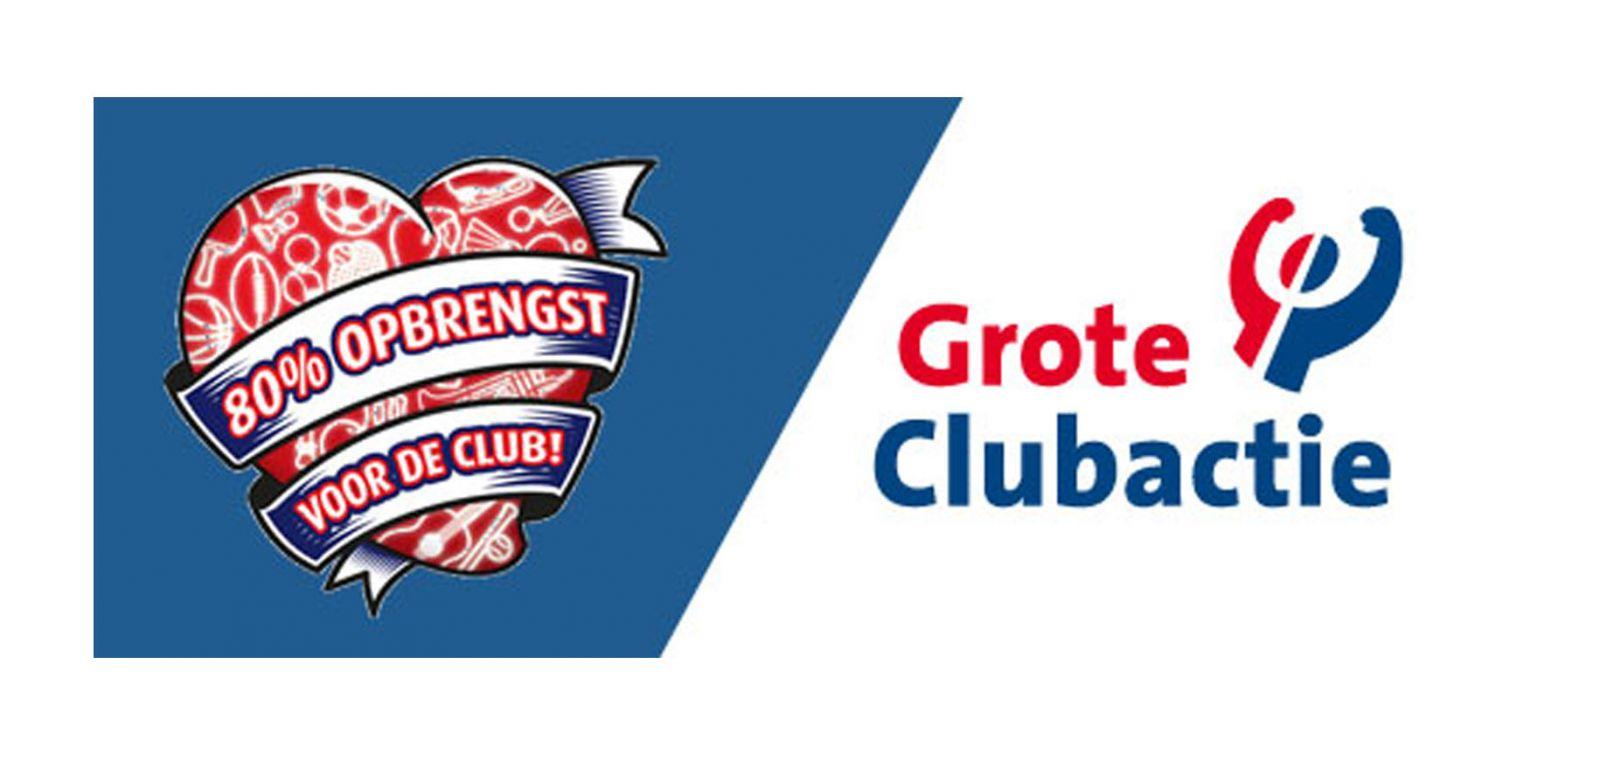 Grote Club-actie: 1000 euro